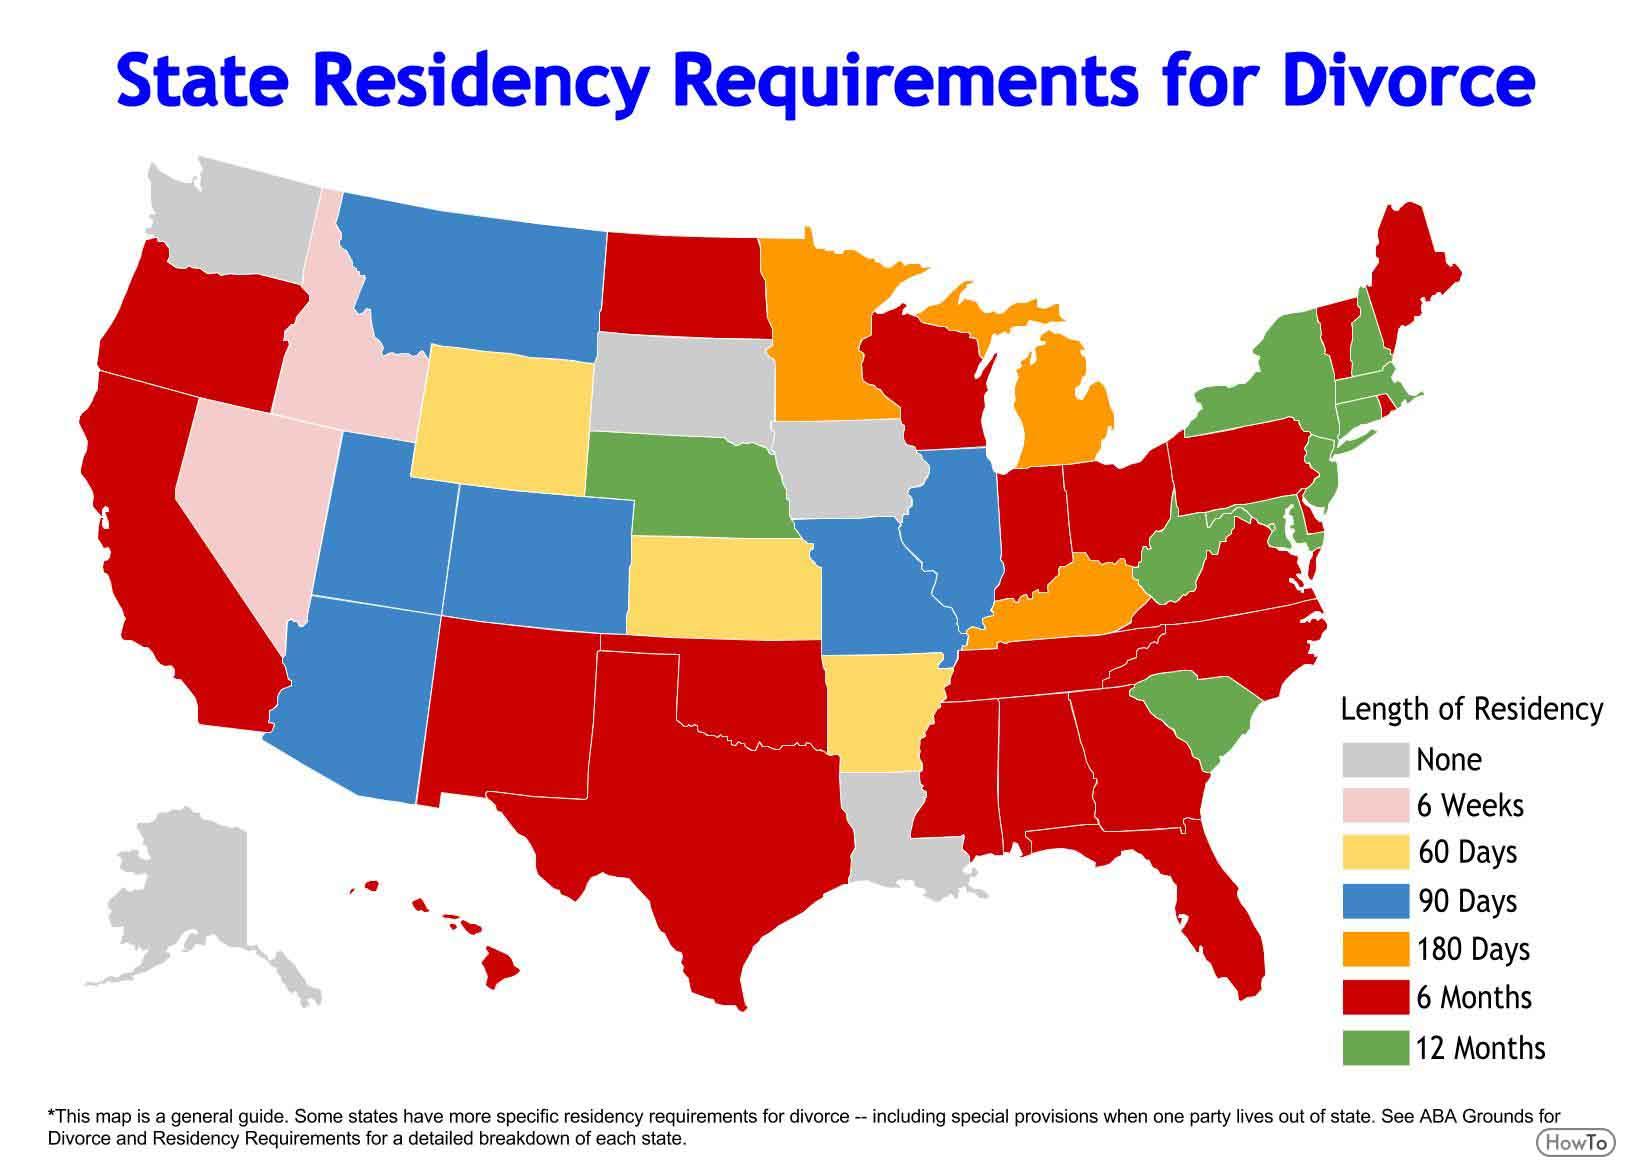 Divorce In Kentucky >> File Divorce In Kentucky In 5 Steps Best Tips Howto